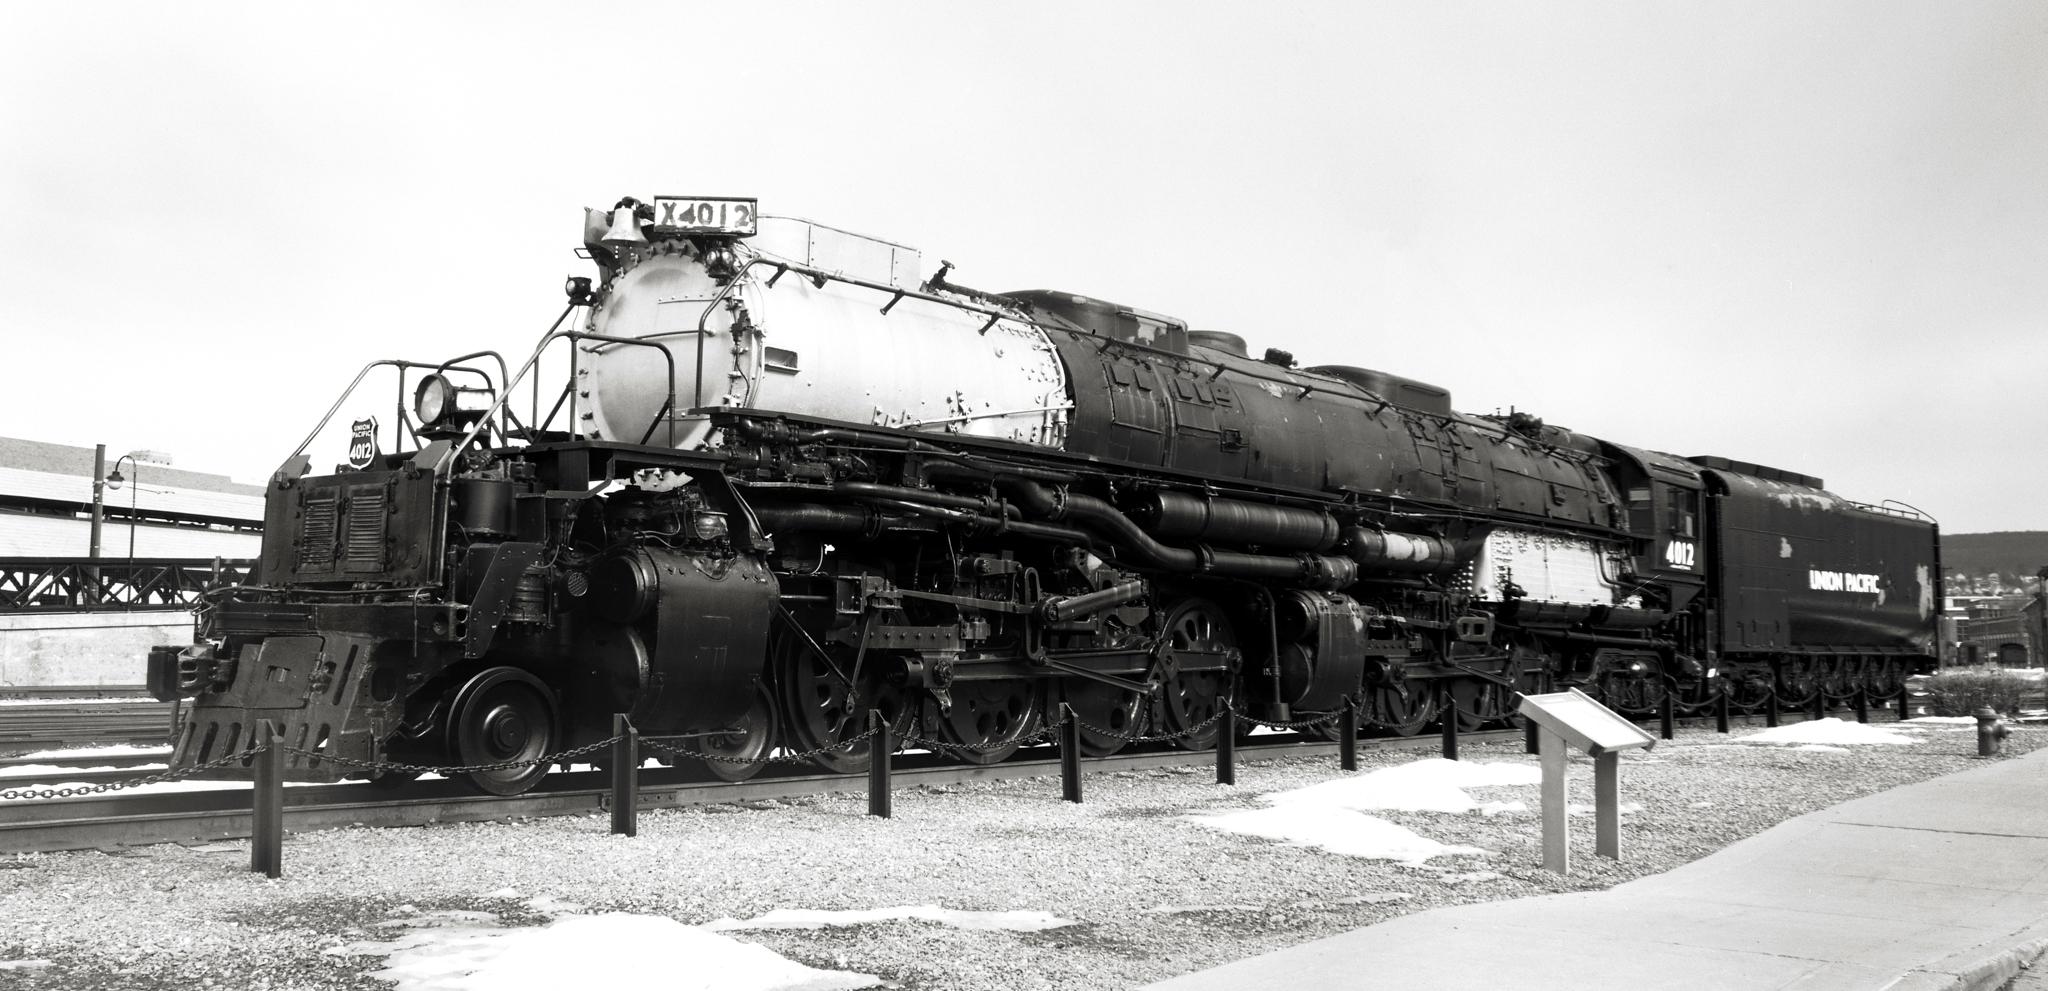 4x5_for_365_project_074_Steamtown_NHS_big_boy_loco.jpg